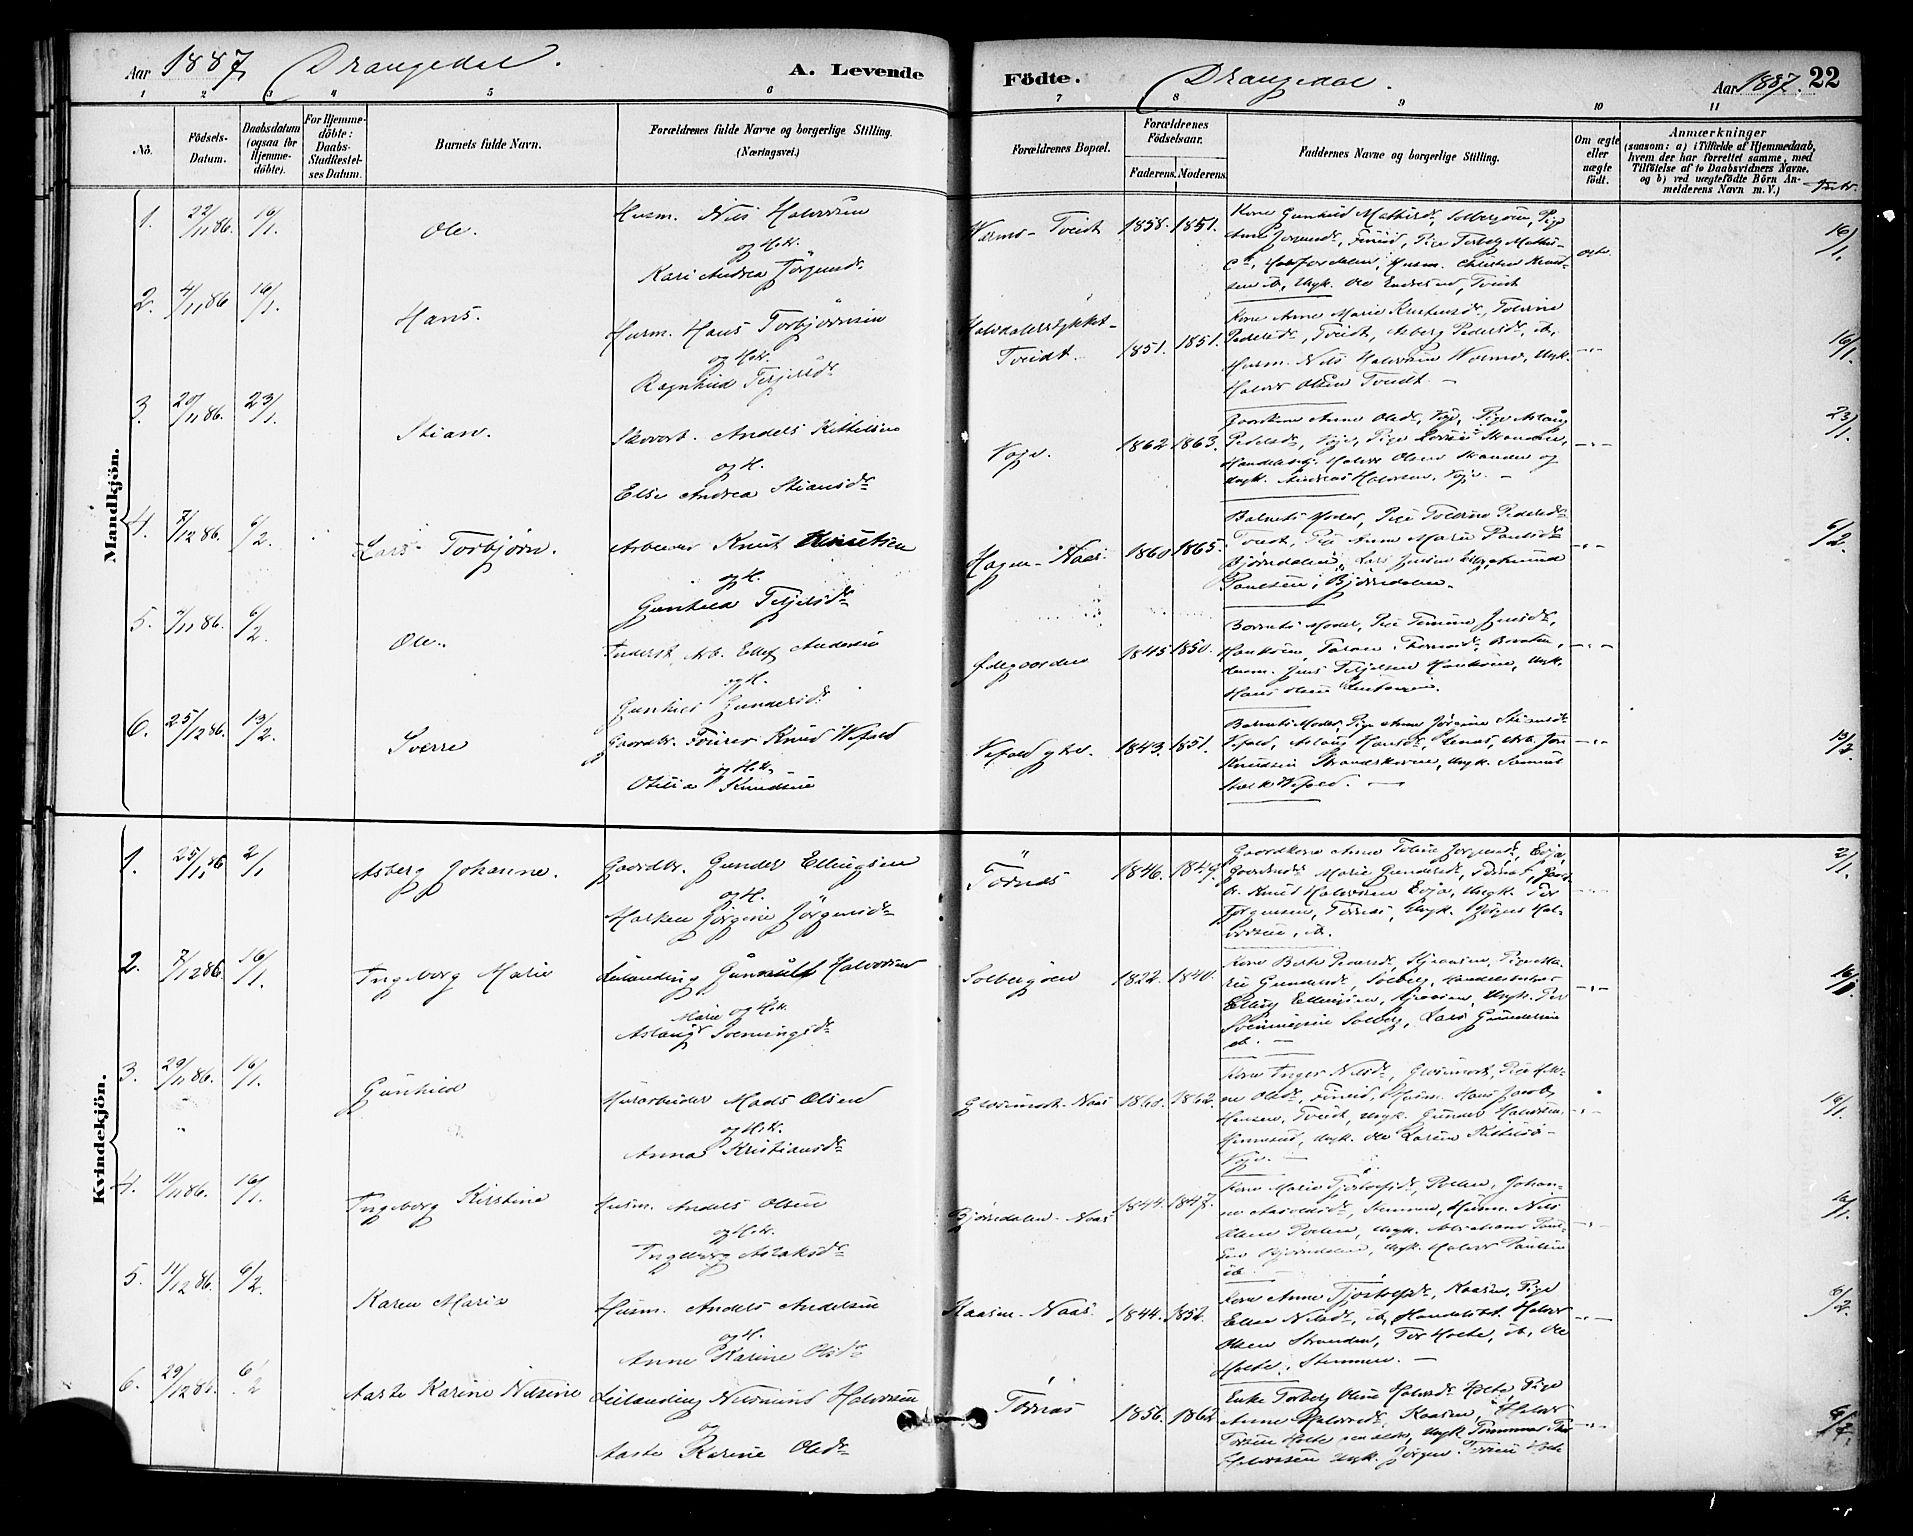 SAKO, Drangedal kirkebøker, F/Fa/L0010: Ministerialbok nr. 10 /1, 1885-1894, s. 22